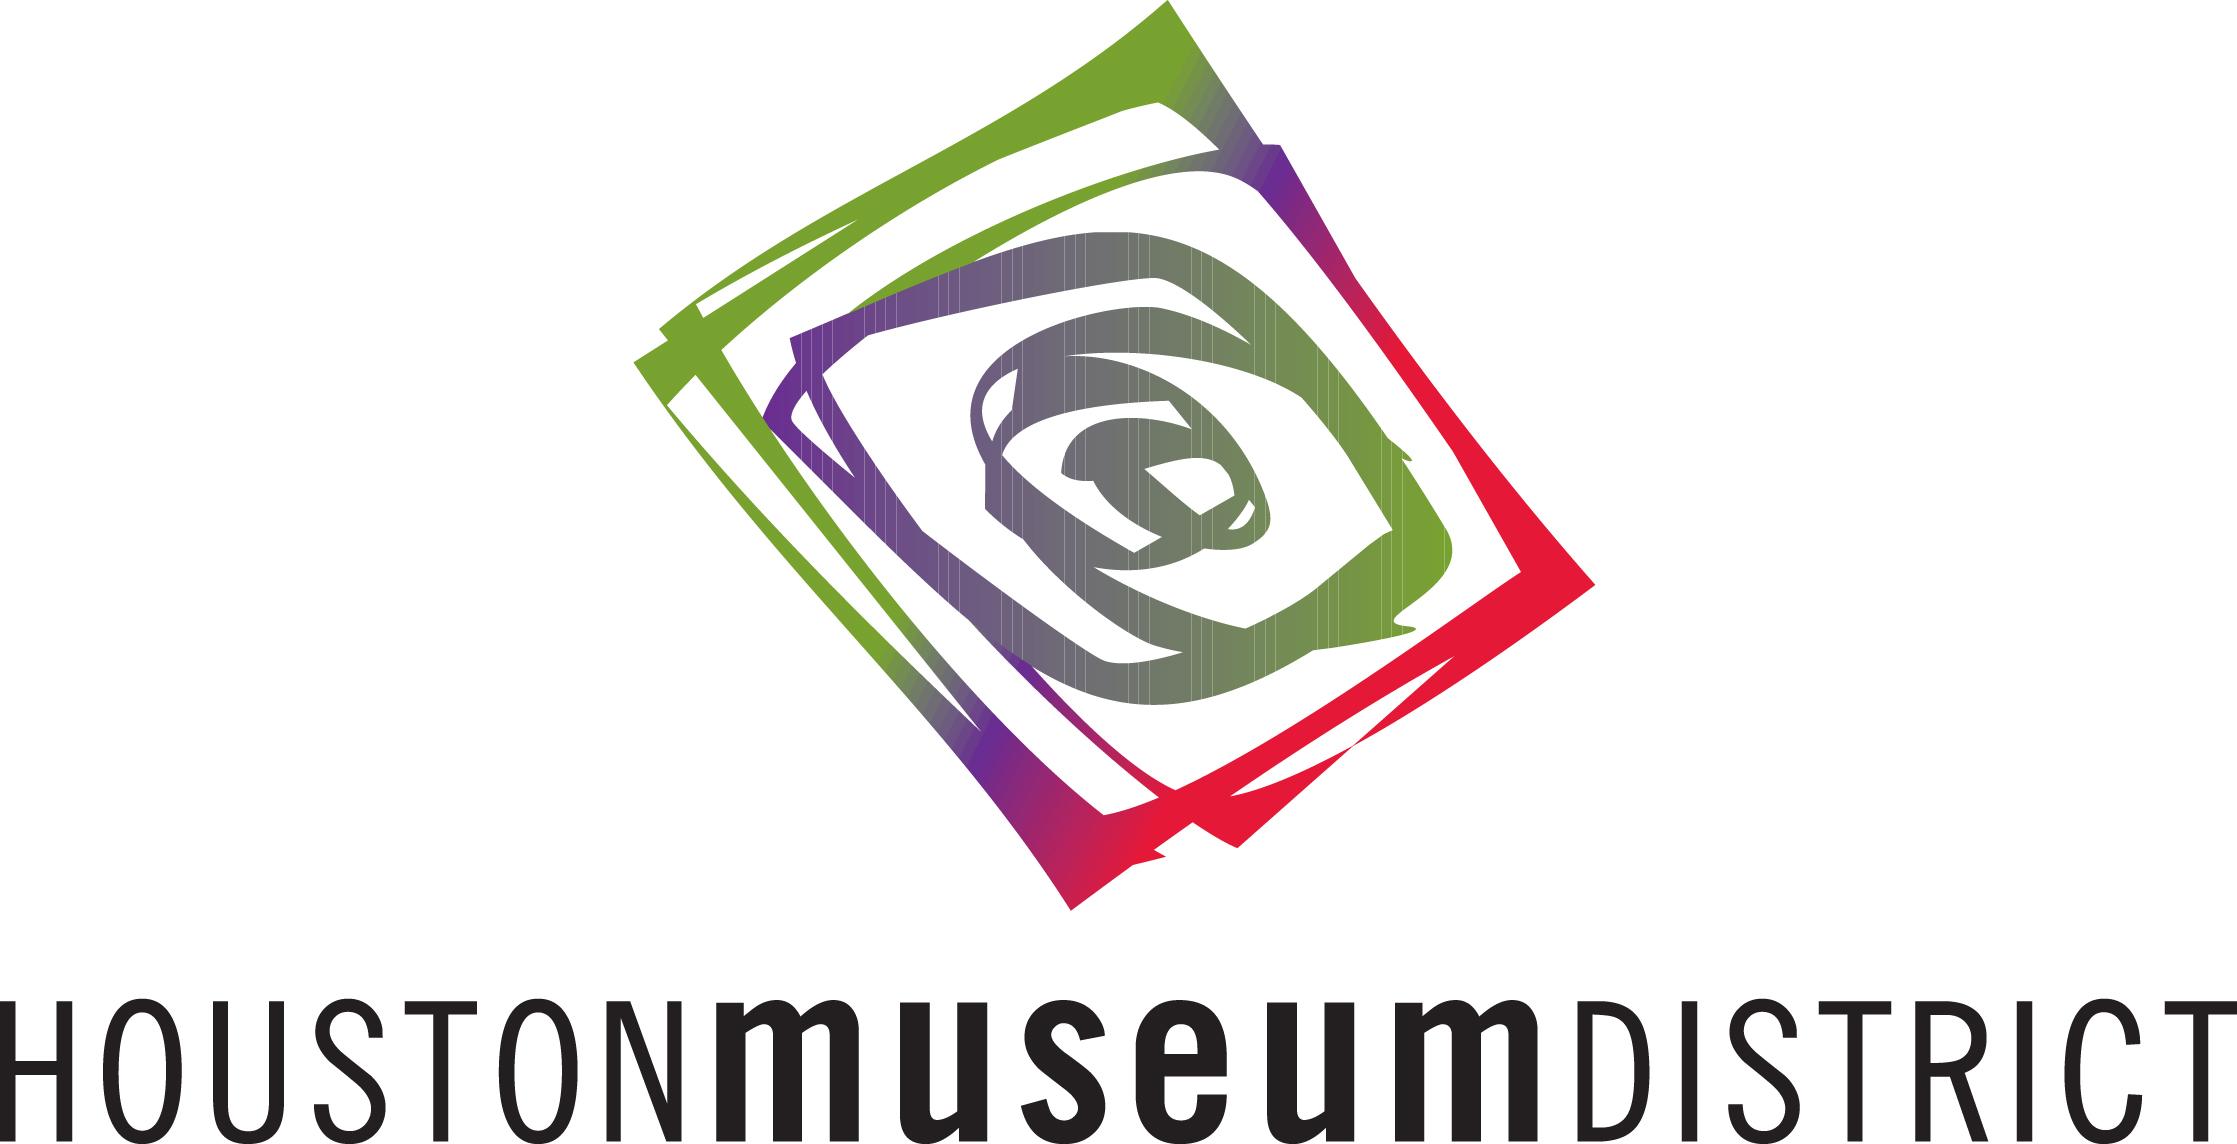 Houston museum district - private driver